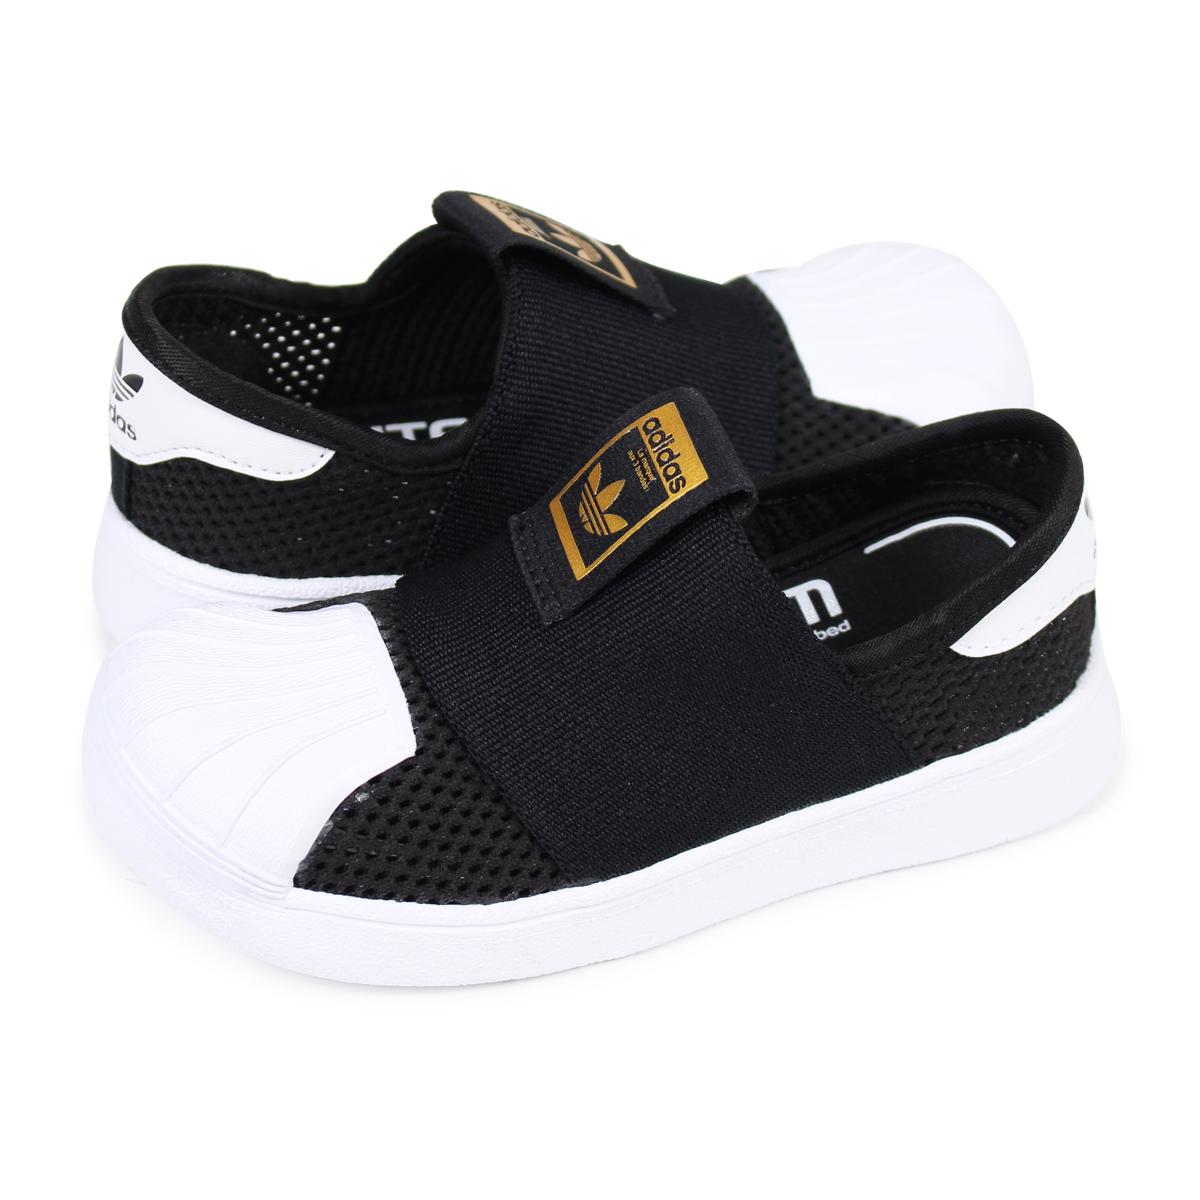 3c45fa891ba ... inexpensive adidas originals ss smr 360 i adidas superstar kids baby  sneakers db0922 black originals 3